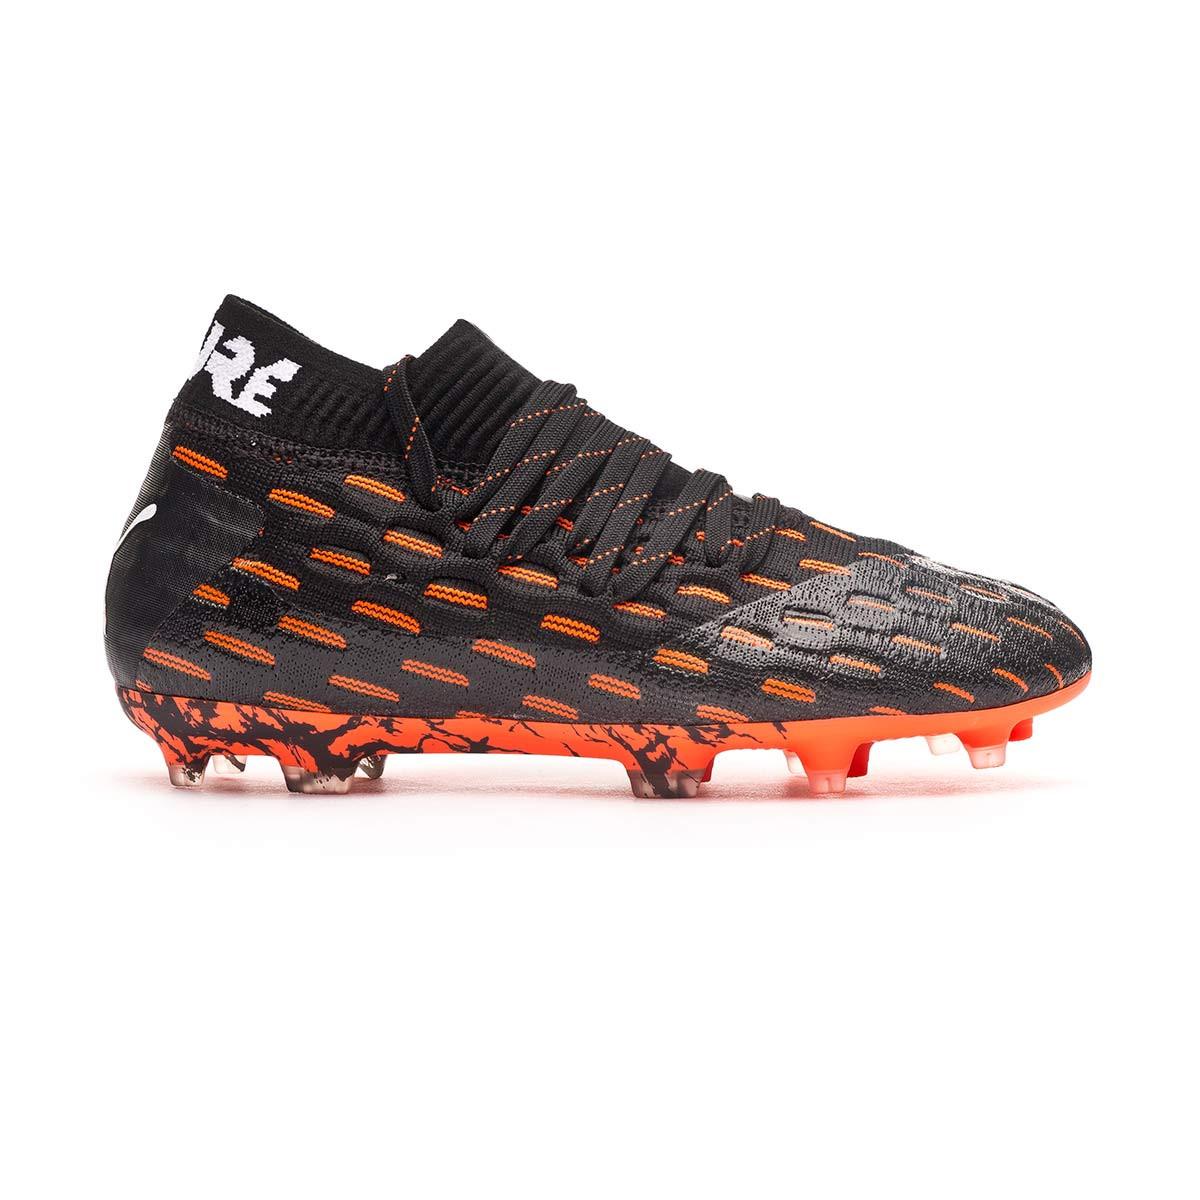 Football Boots Puma Future 6.1 Netfit